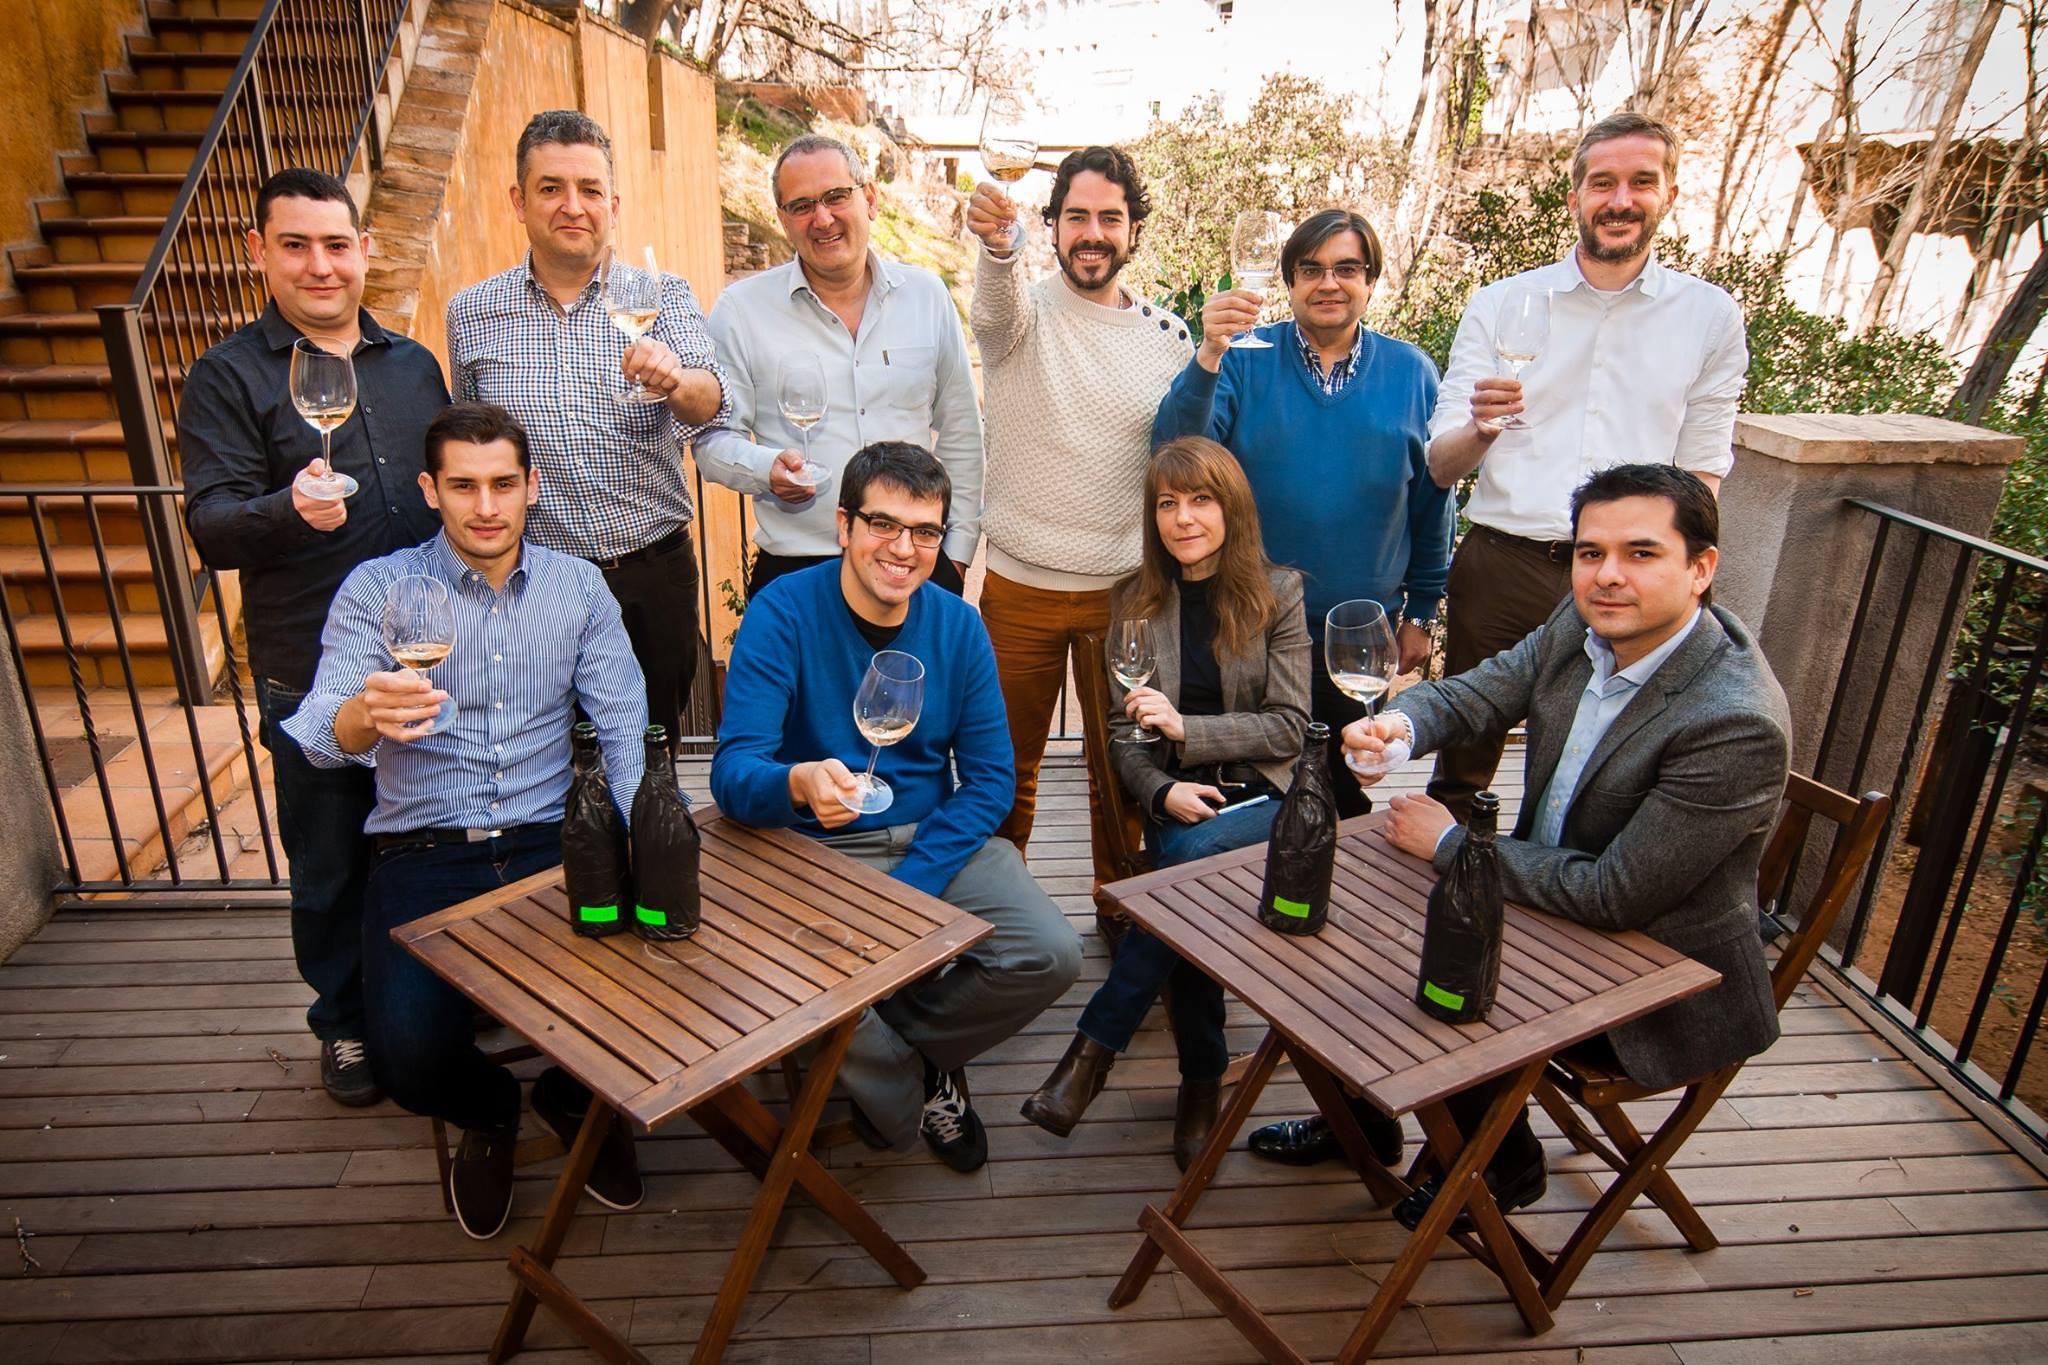 Juancho Asenjo comité de cata Jordi Melendo